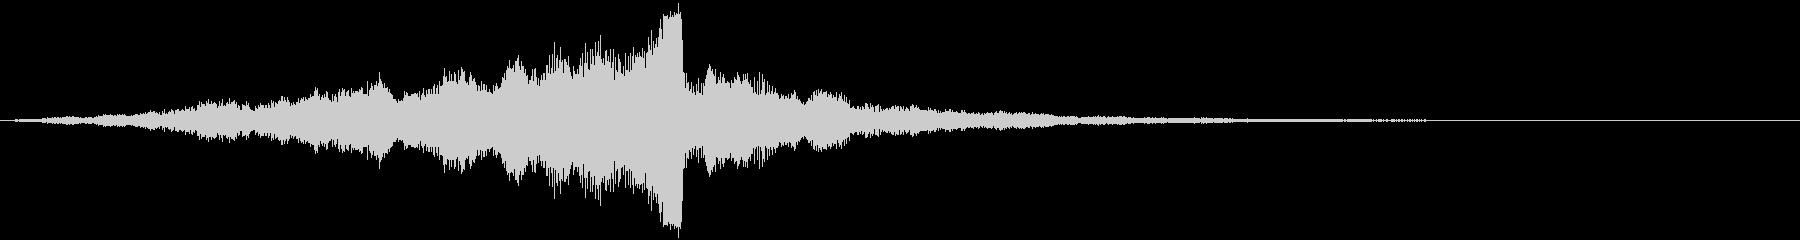 CINEMATICな音で始まる映像の未再生の波形